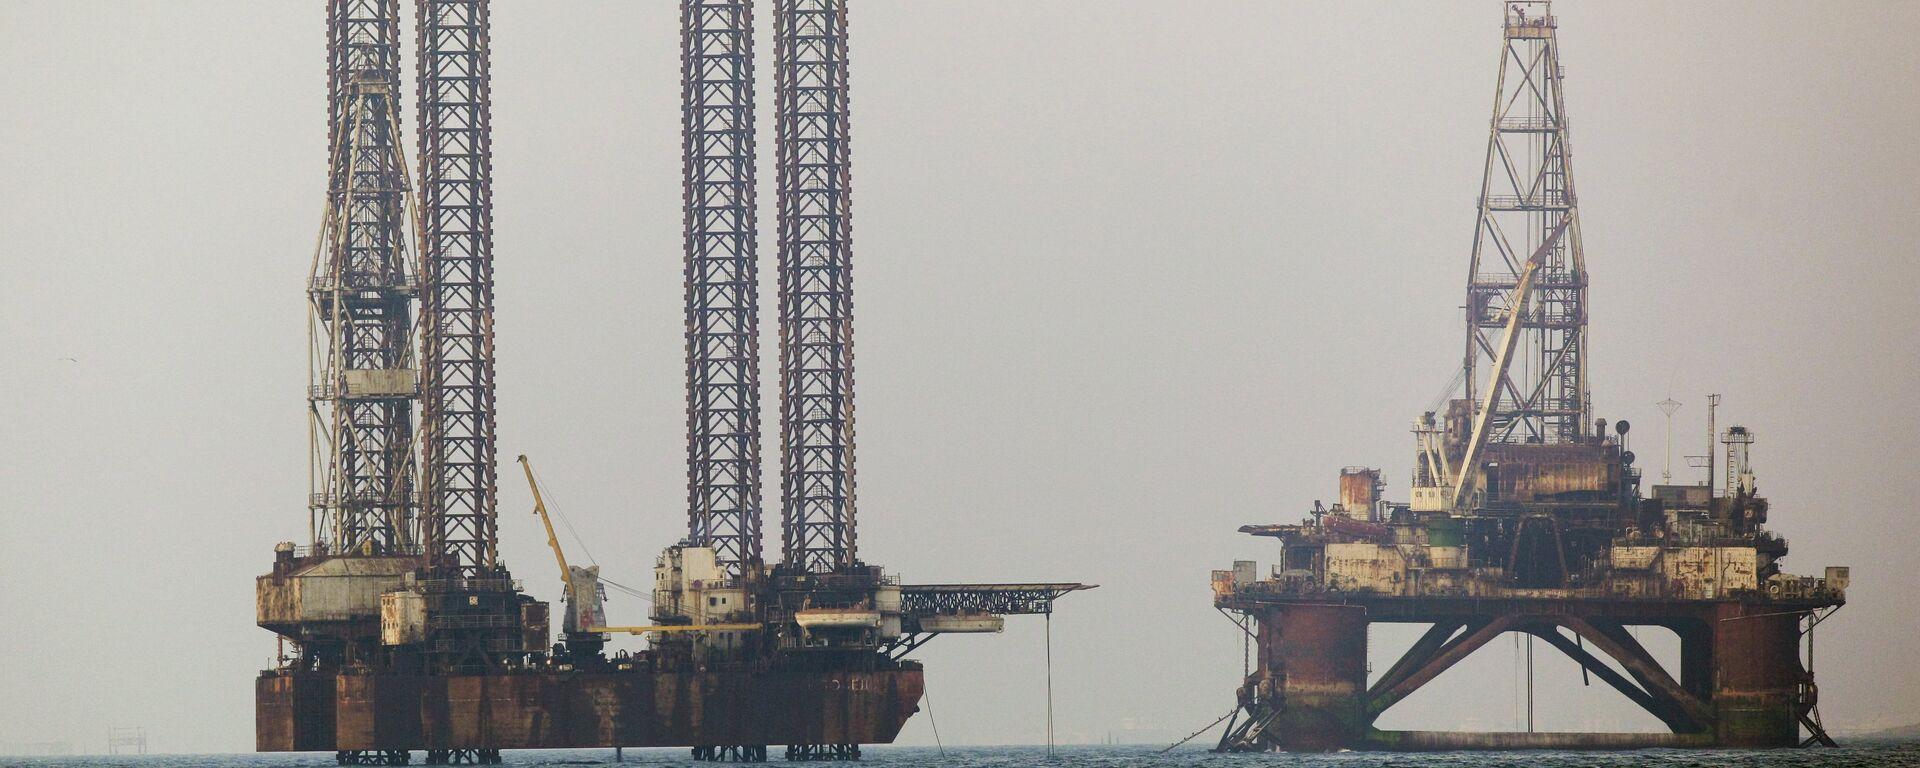 Estrazione petrolio nel Mar Caspio - Sputnik Italia, 1920, 20.07.2021